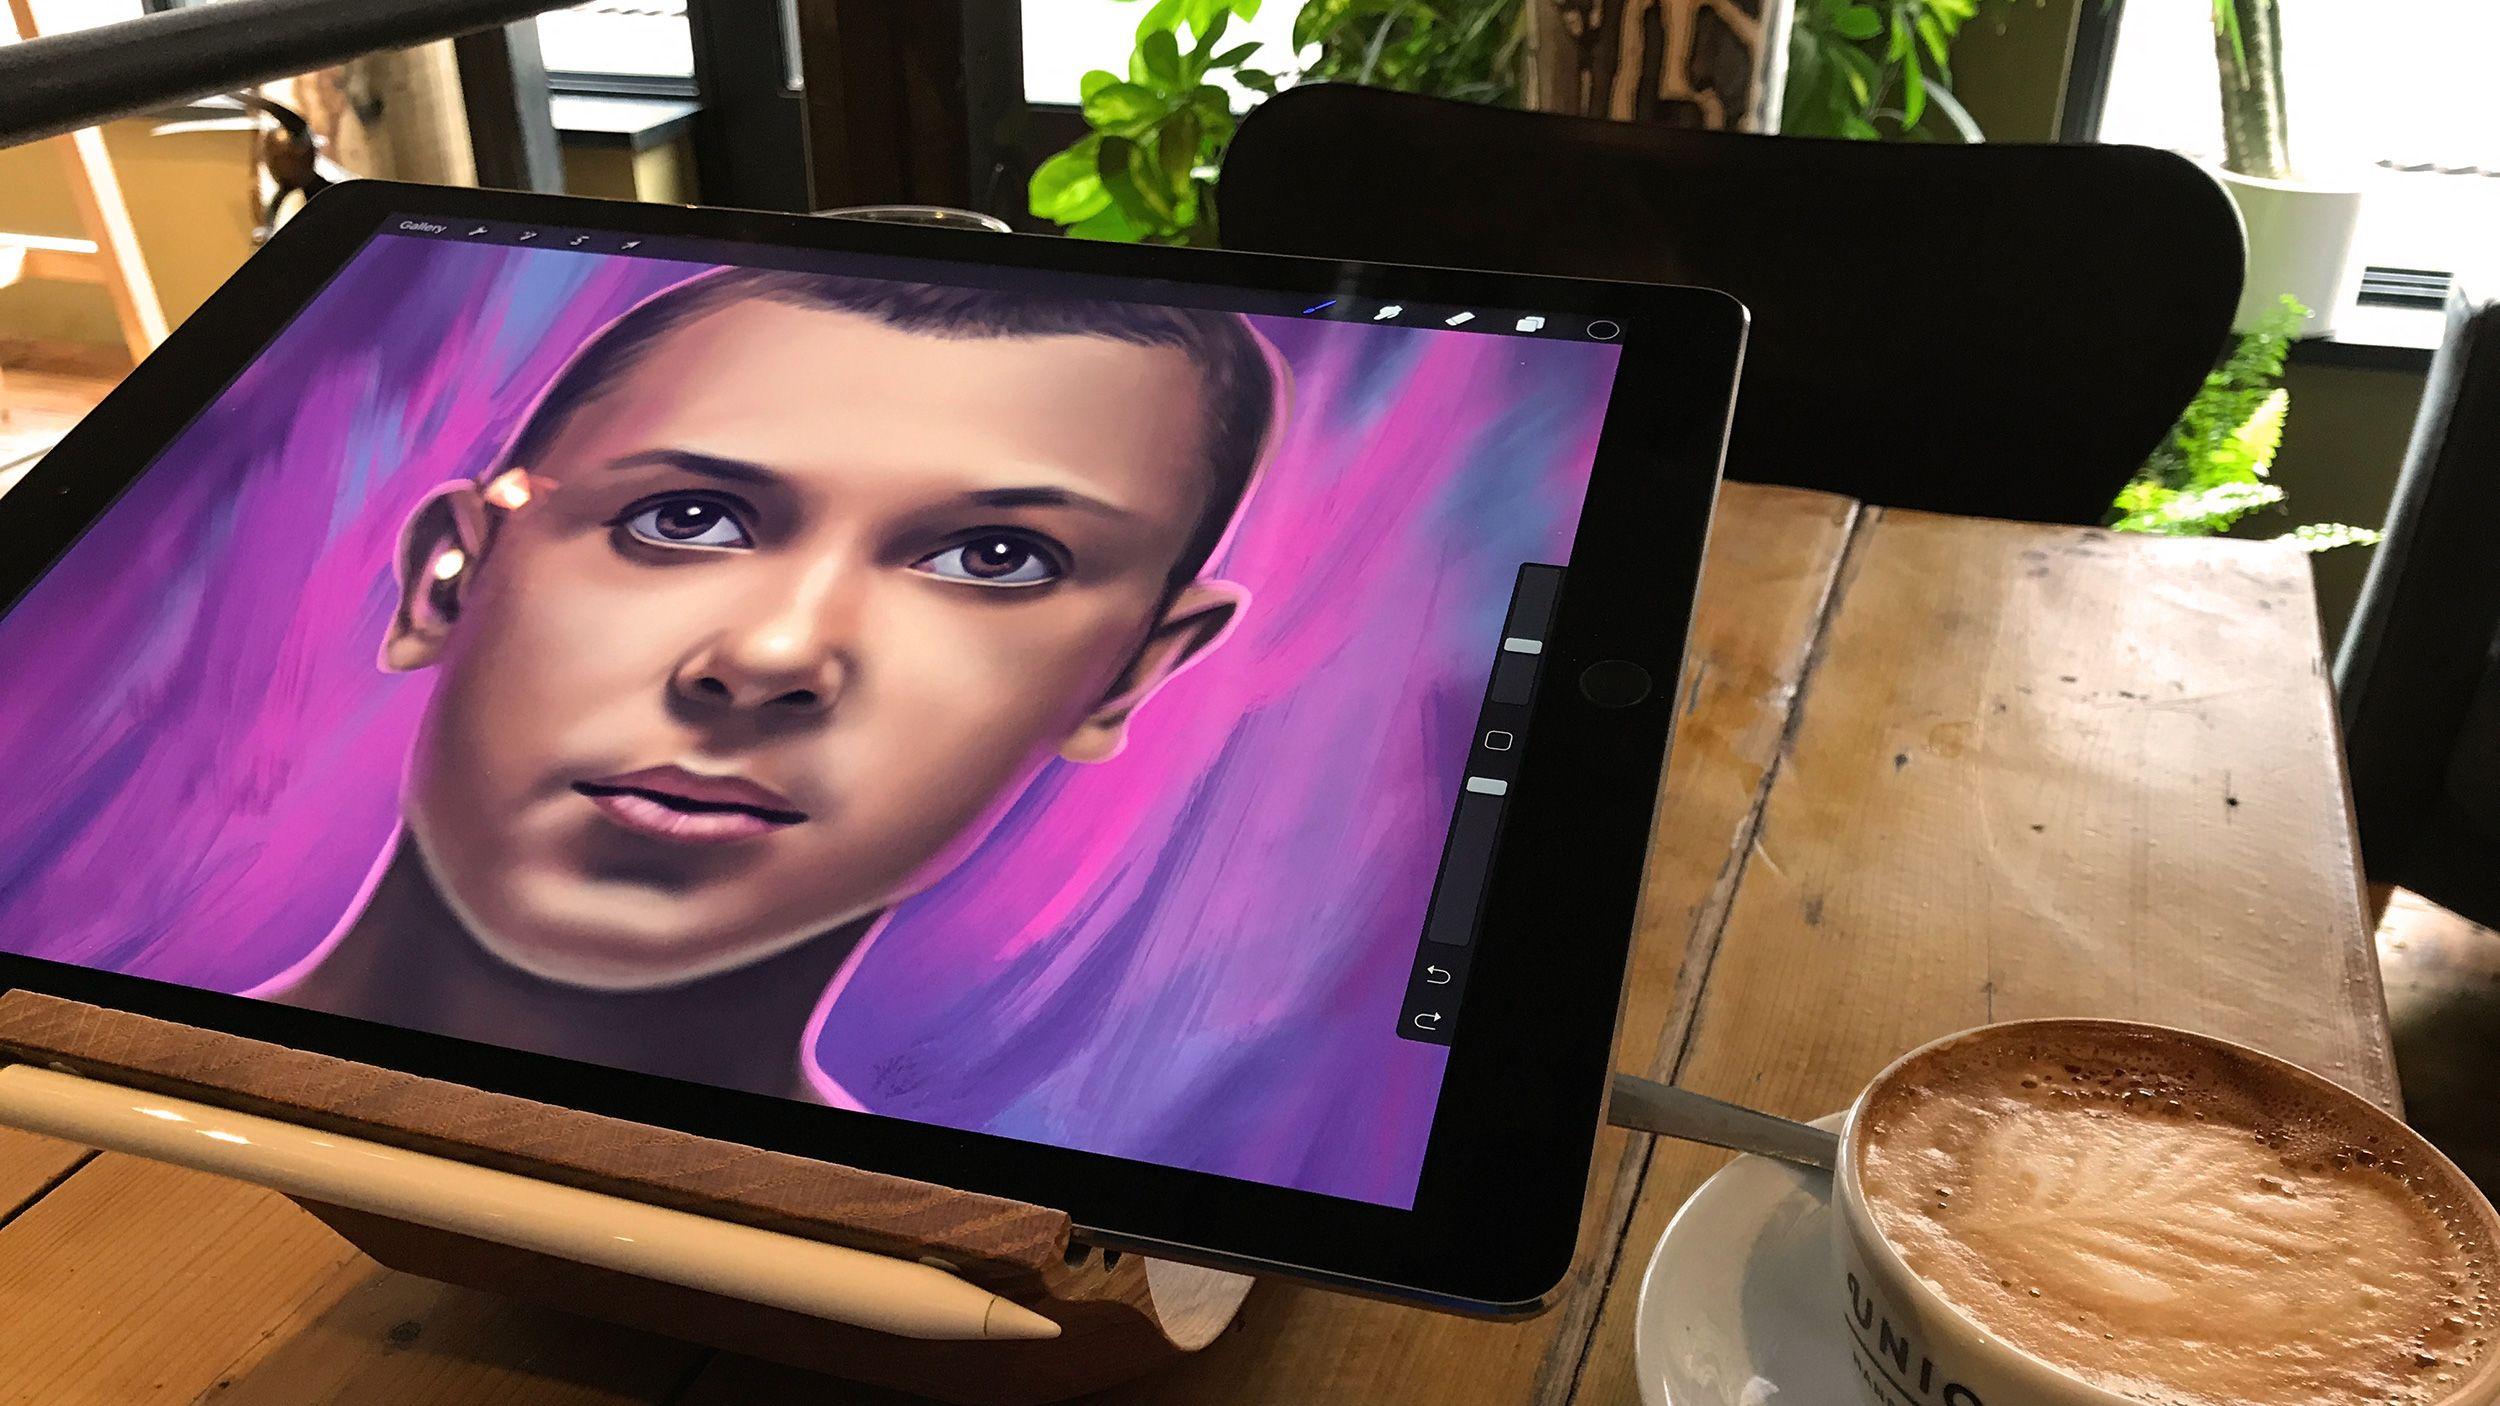 Review: Procreate 4 | Apple Pencil/iPad/Procreate Art | Ipad